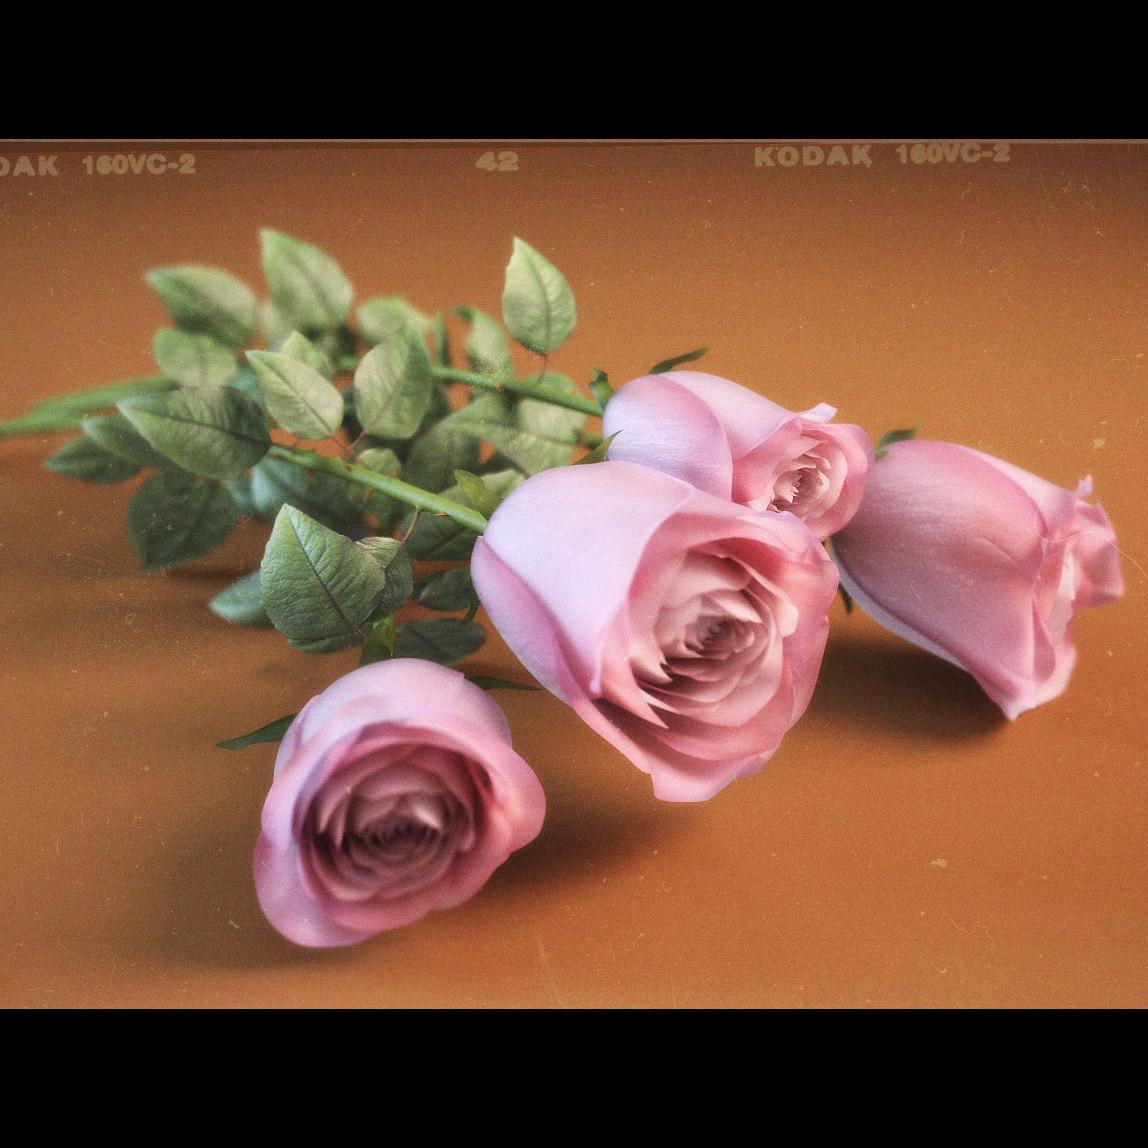 Roses_on_floor_1.jpg